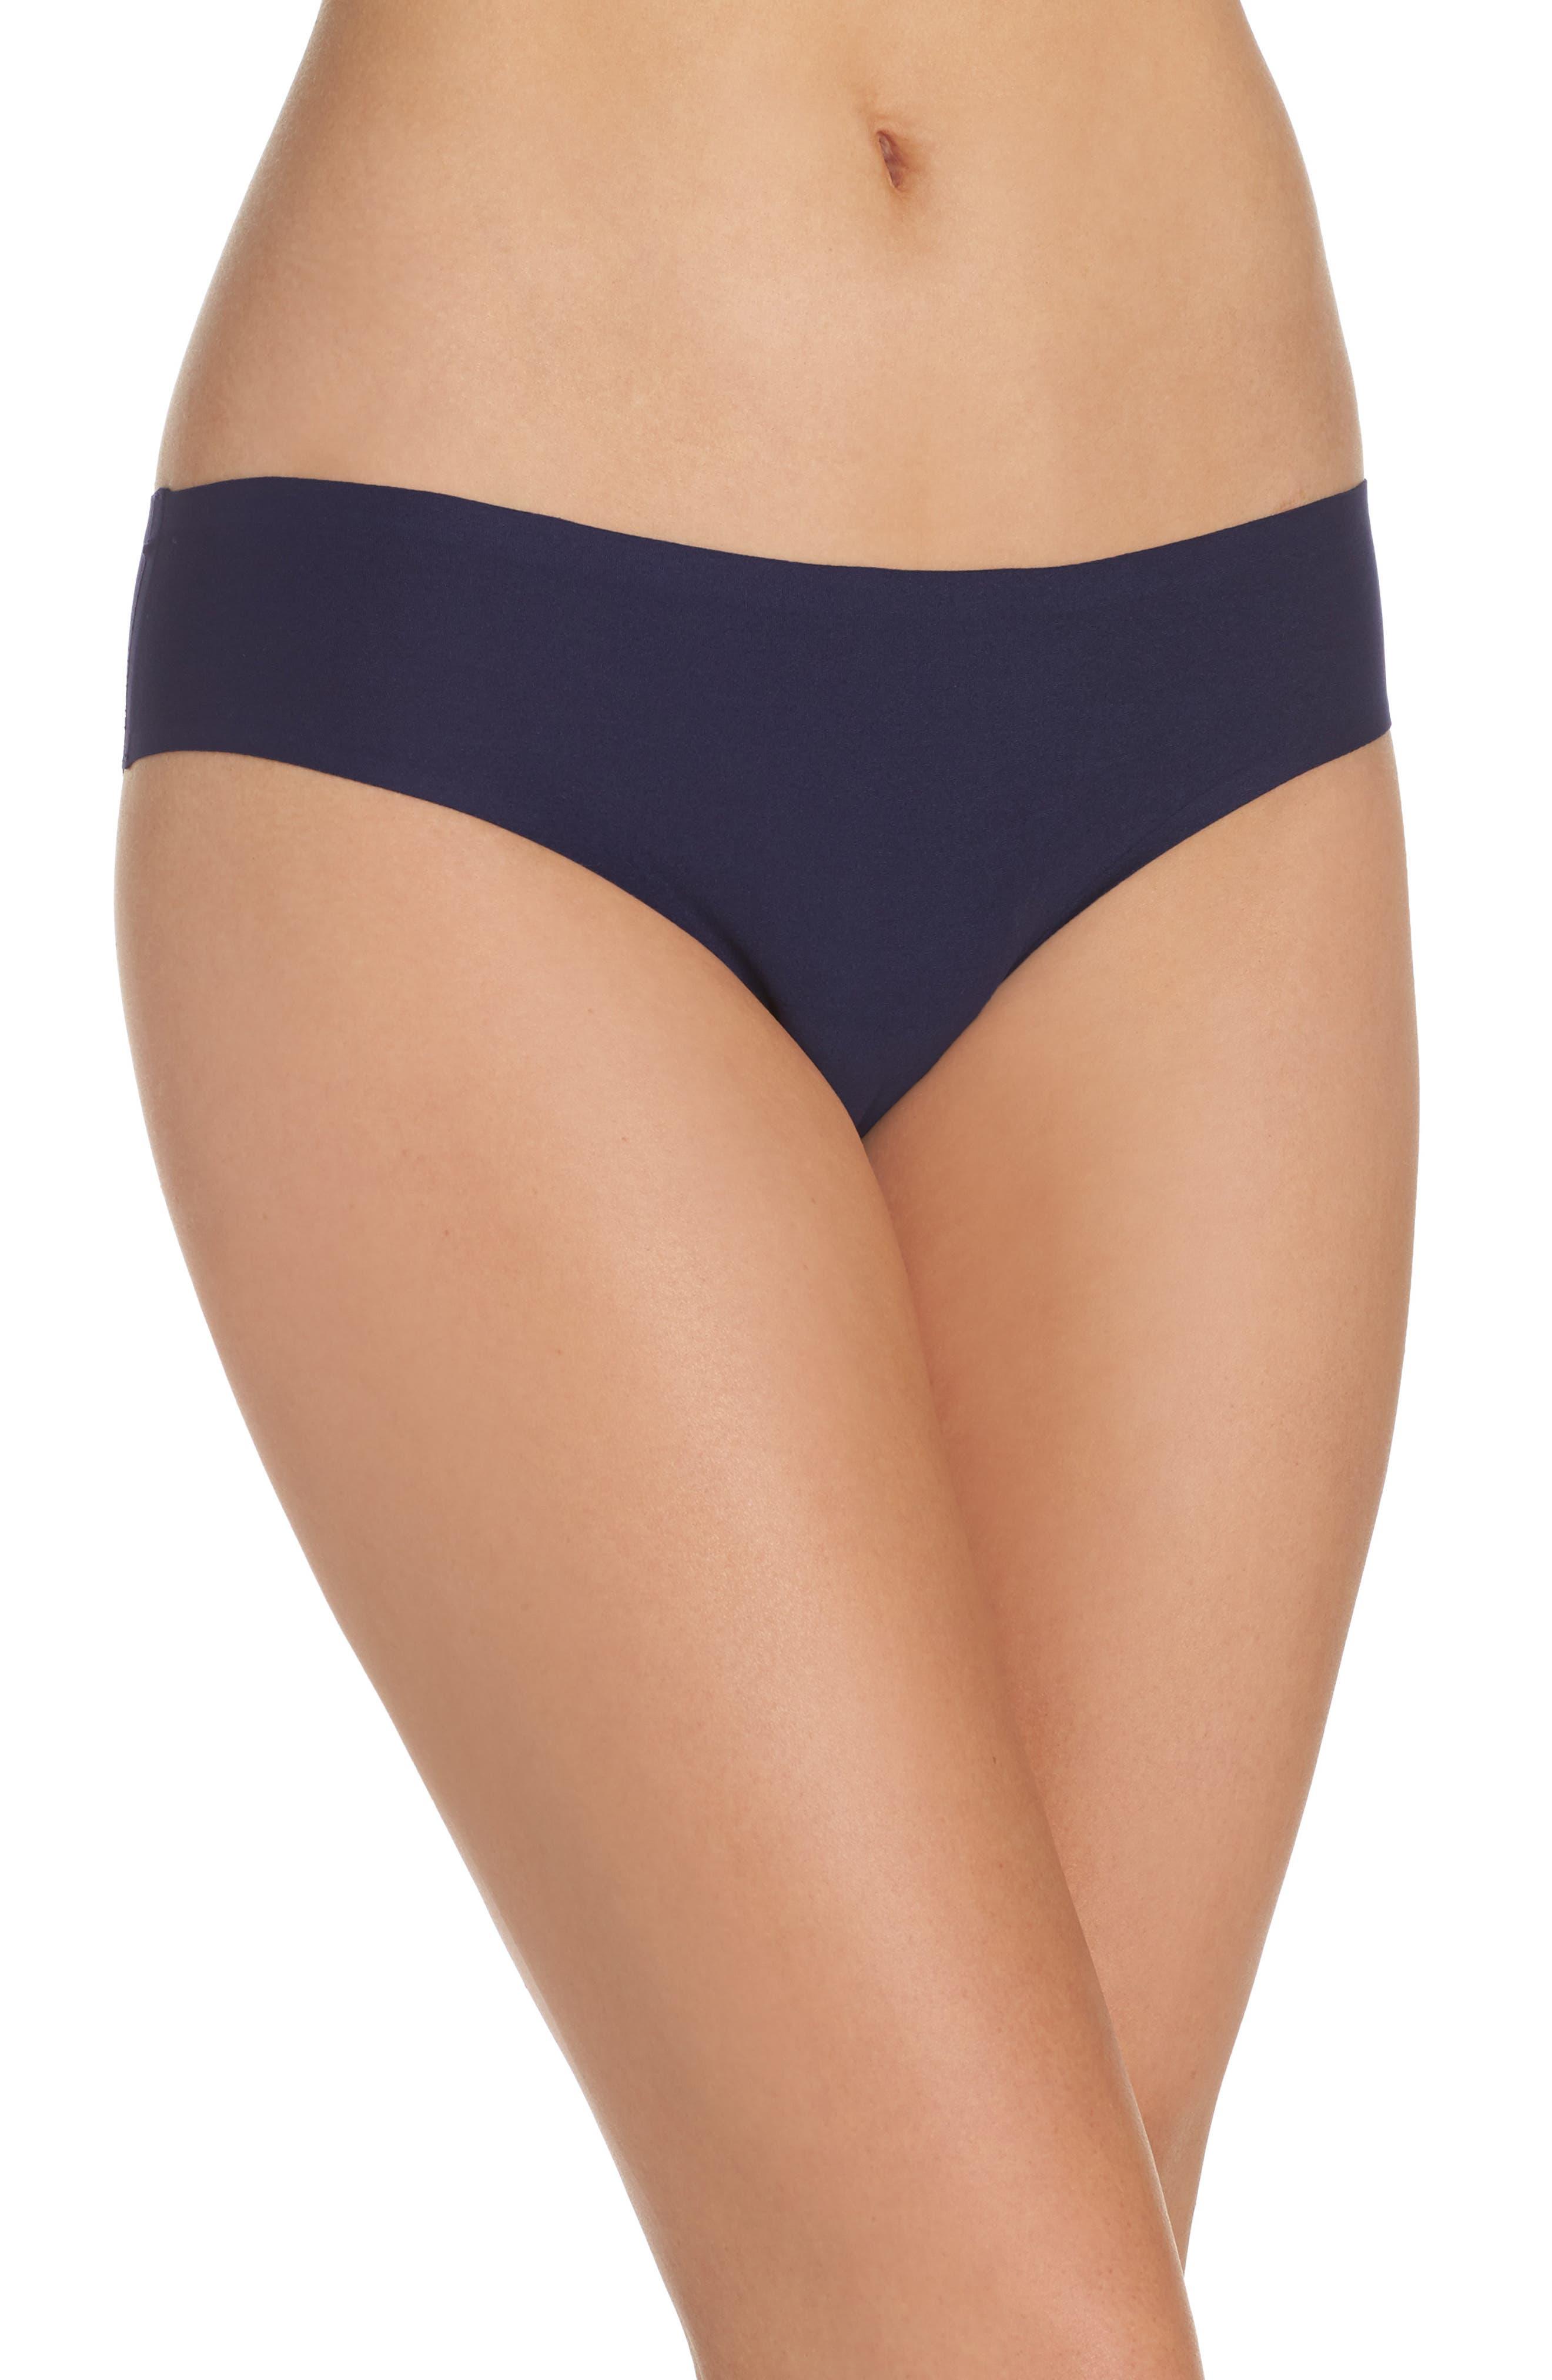 Chantelle Intimates Seamless Bikini (3 for $45)